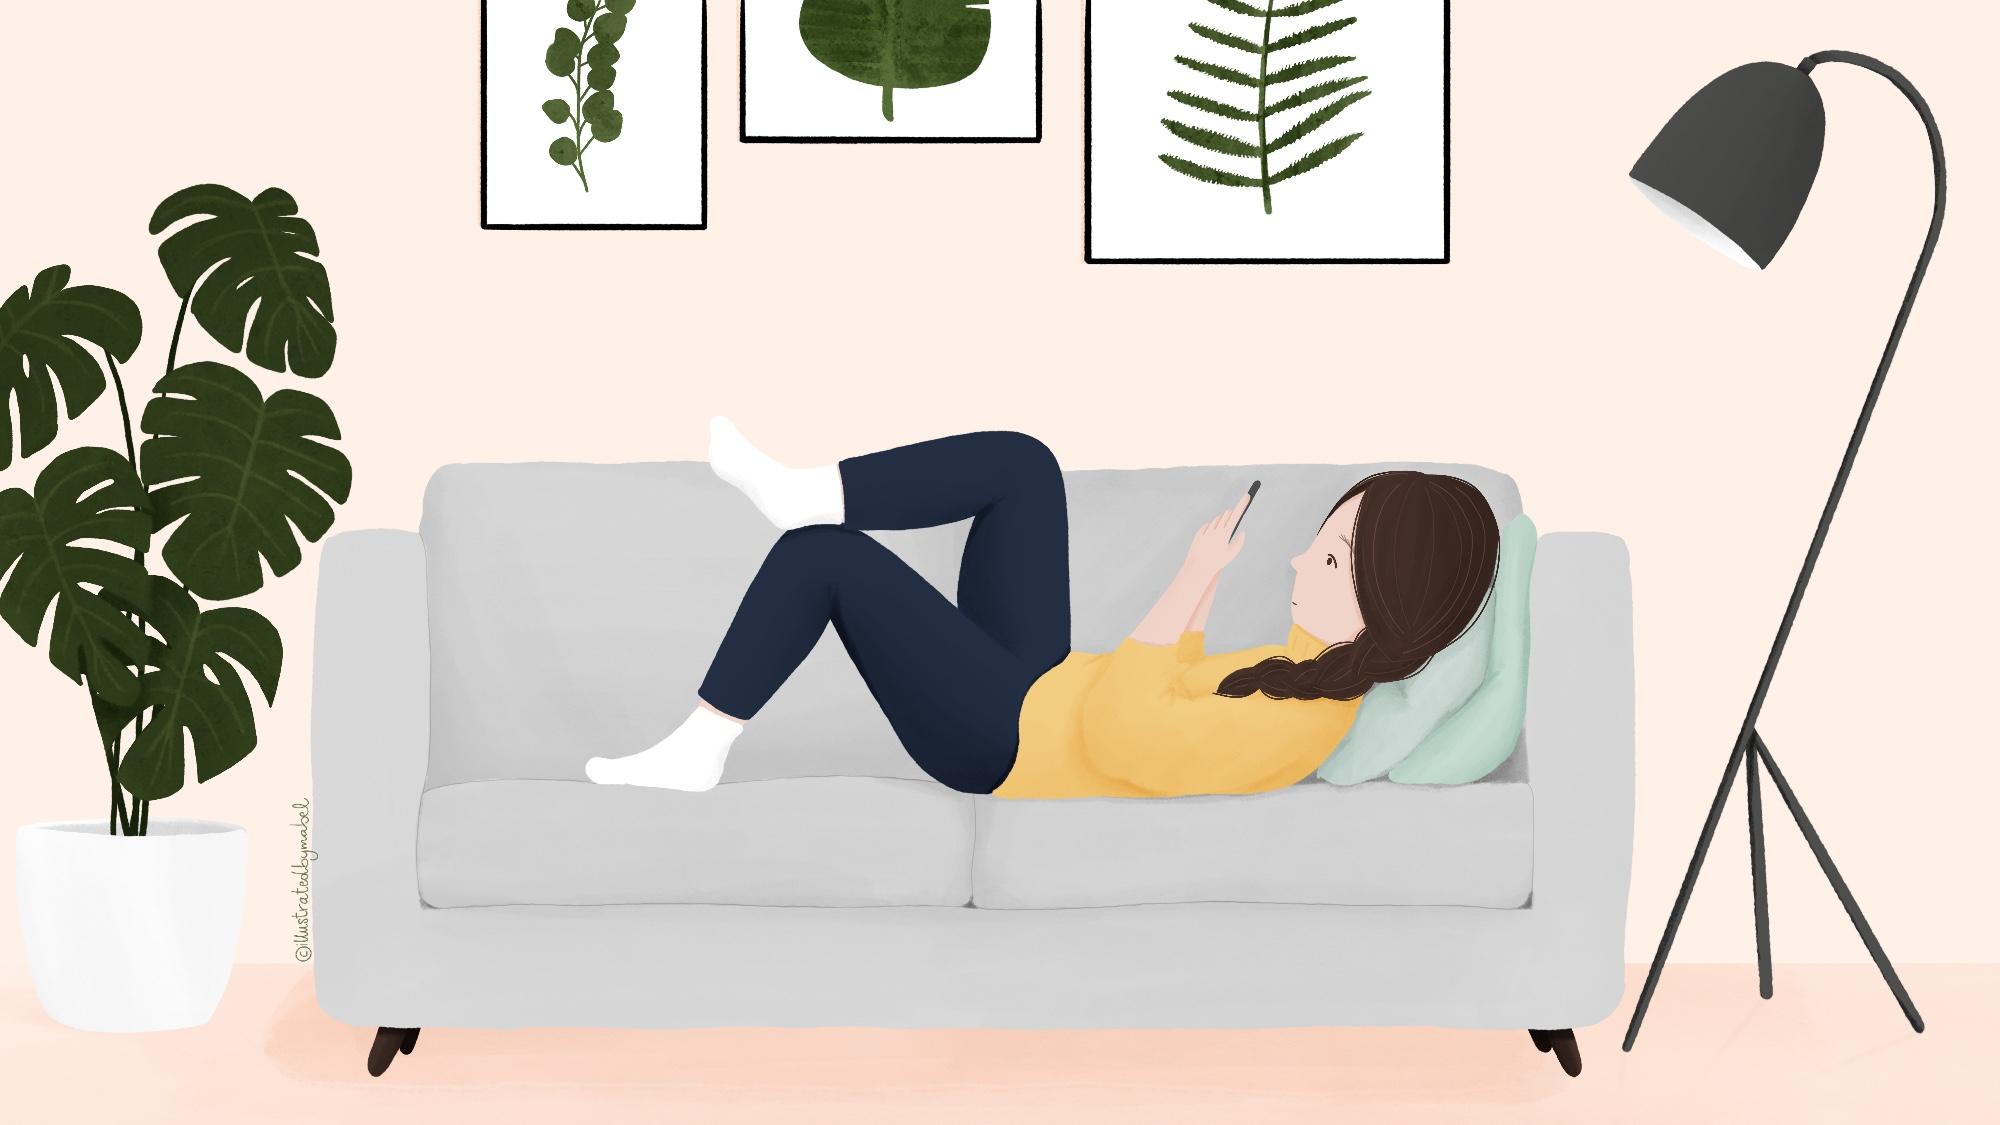 Phone sofa woman illustration